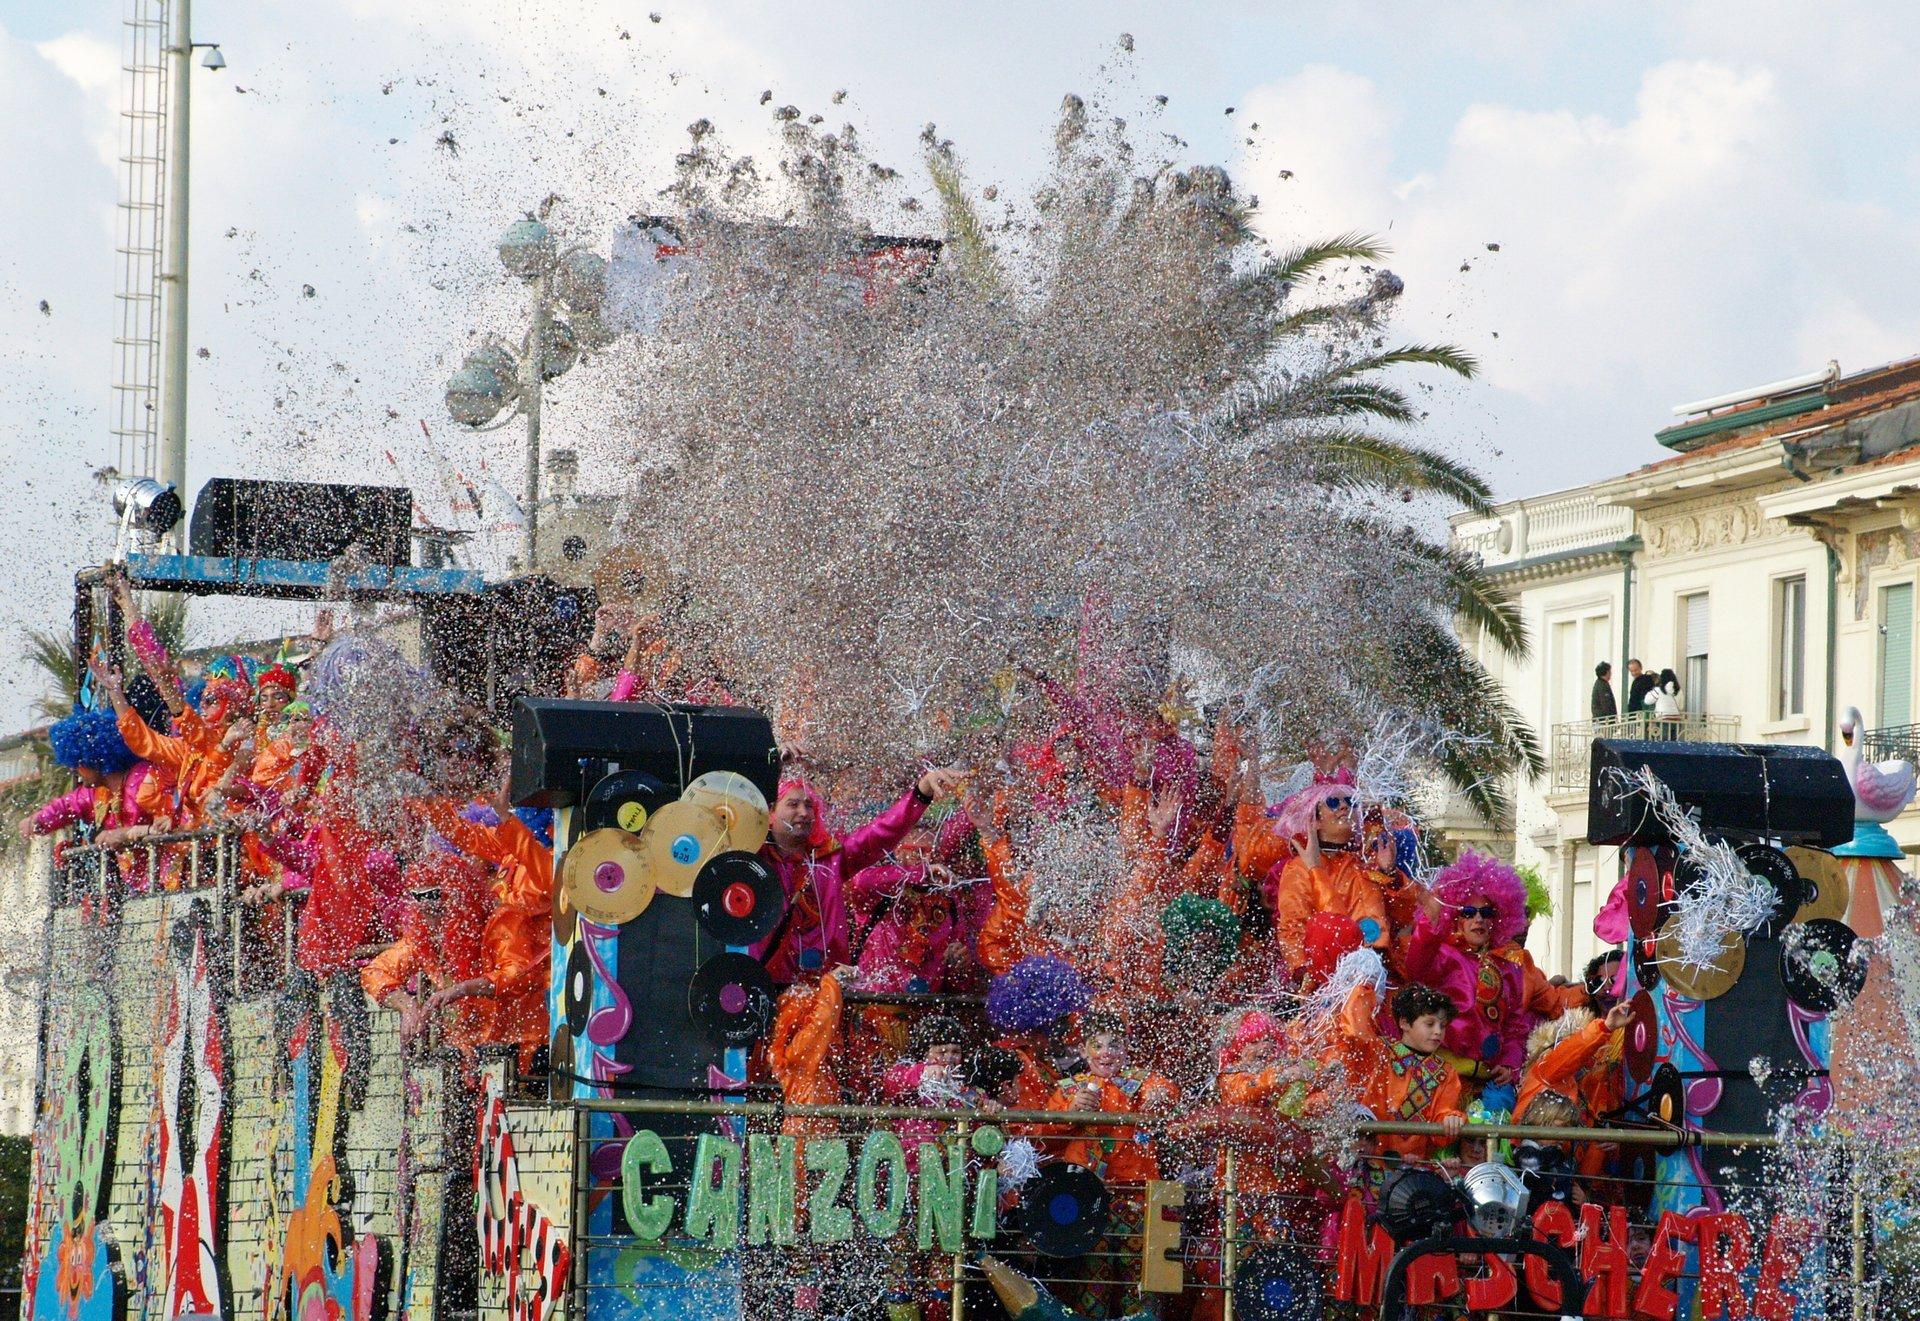 Viareggio Carnevale 2020